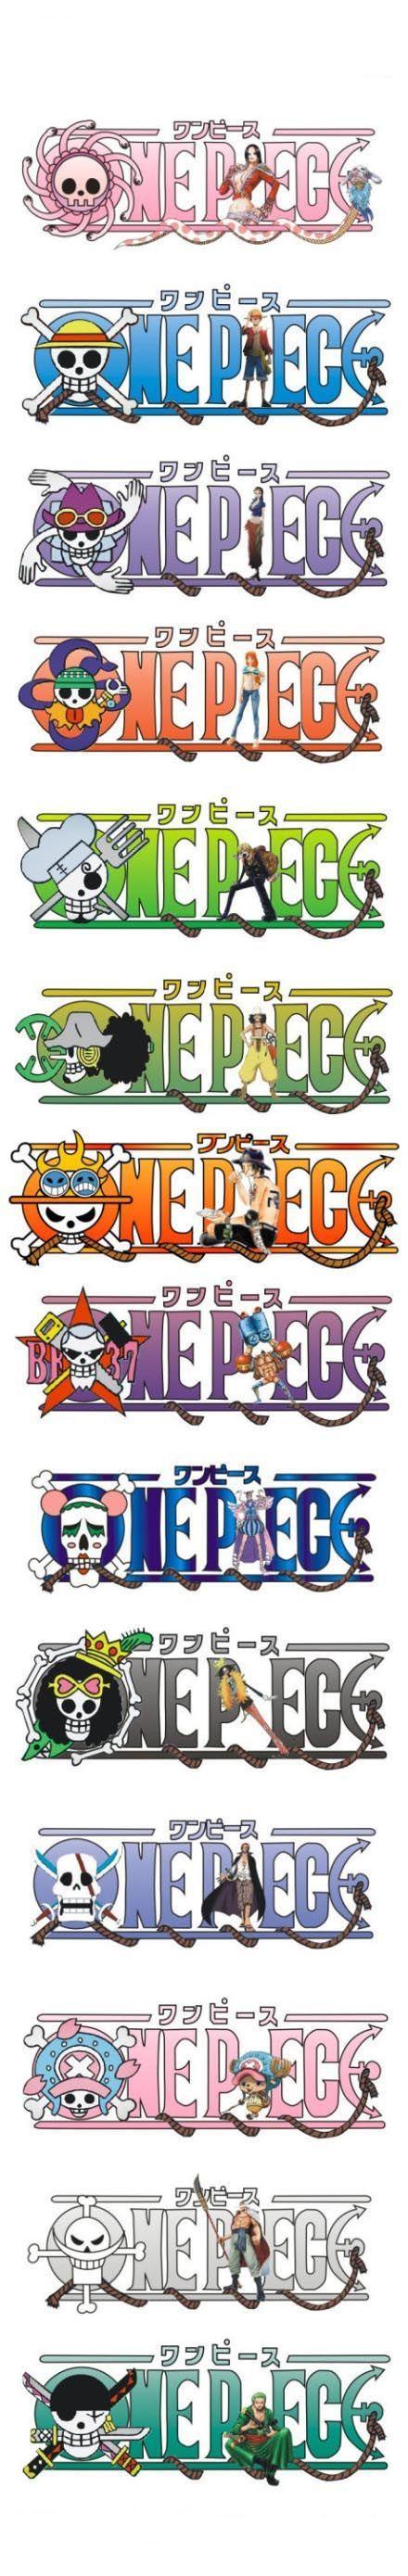 One Piece Pirate Skull Symbols Boa Hancock Monkey D Luffy